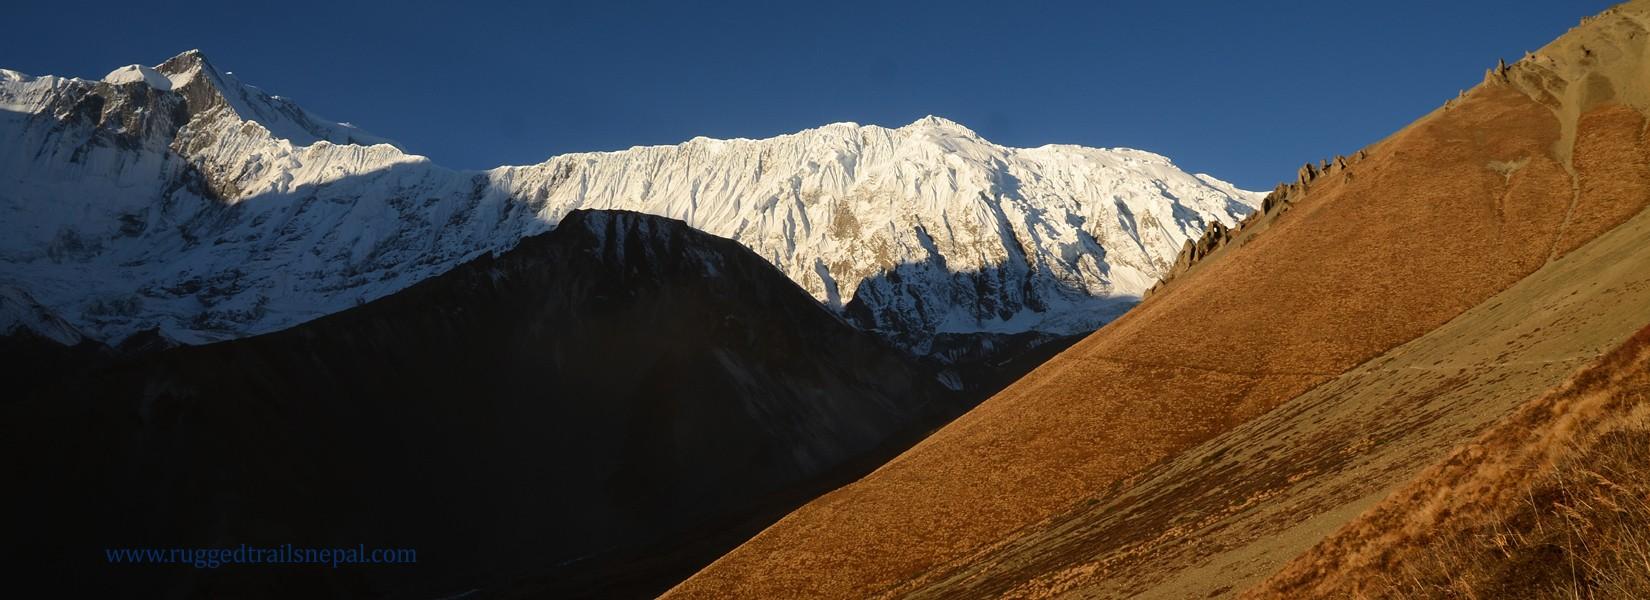 annapurna mountain view trek nepal